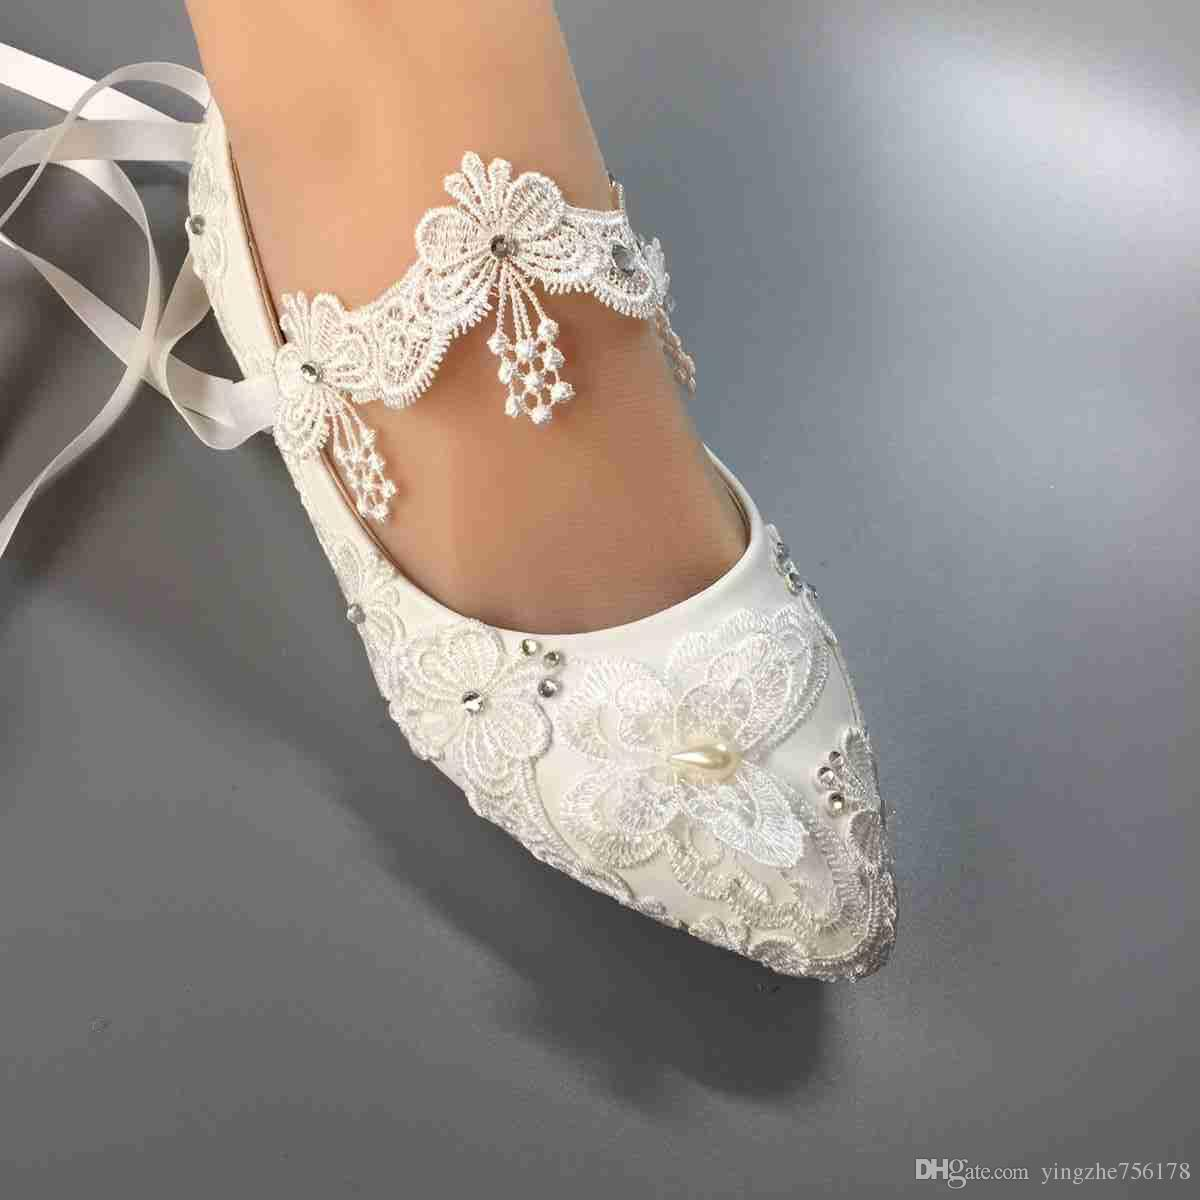 f8d11bf87980 Women Wedding Flat Shoes Waterproof White Lace Bride Wedding Dresses HEEL  Diamond Lace Manual Wedding BRIDAL Shoes SIZE EU 35 42 Mother Of Bride Nude  ...